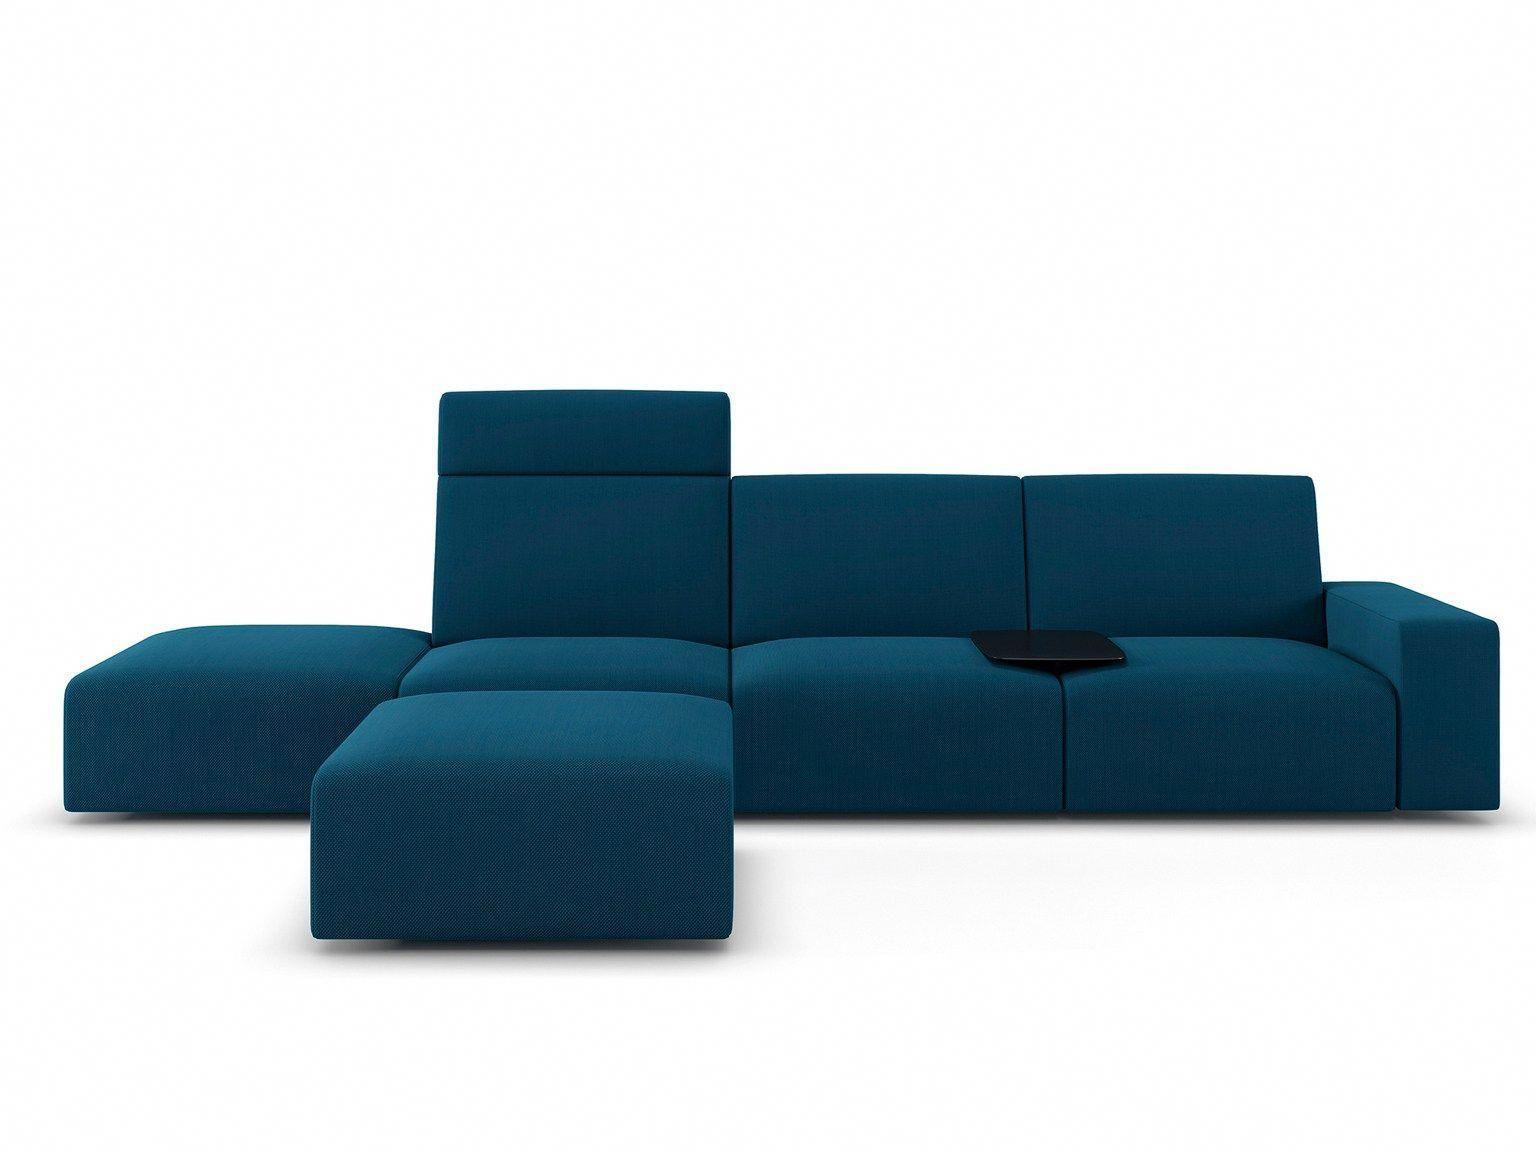 Cheapest Furniture Market In Kolkata Furnitureupholsterycleaners Modularfurniture Modular Sofa Modular Sofa Design Sofa Design